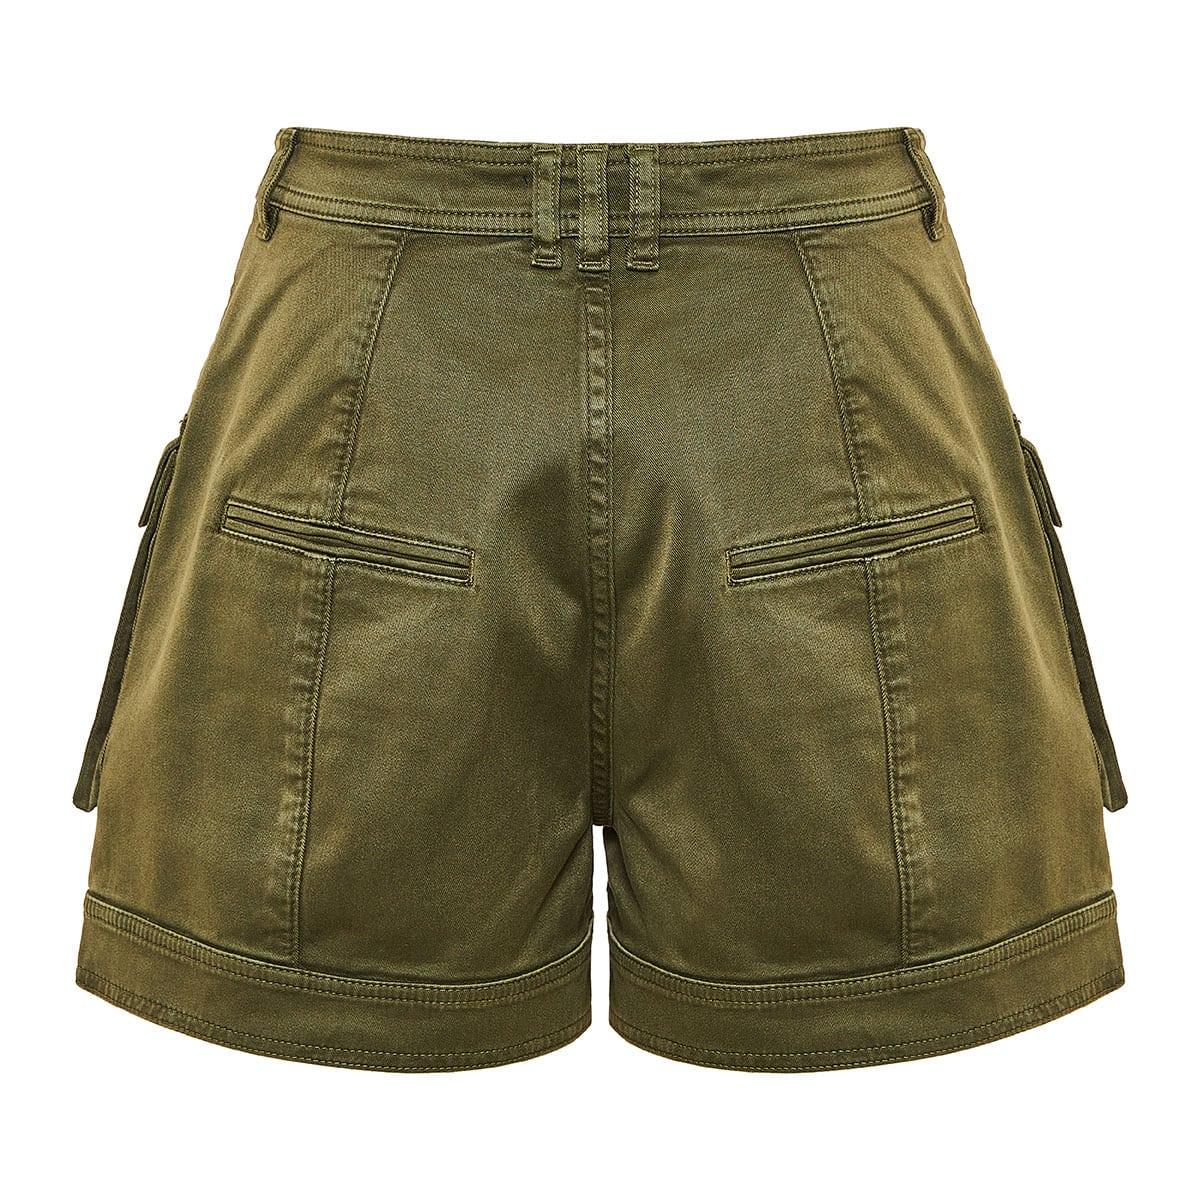 High-waist cargo shorts